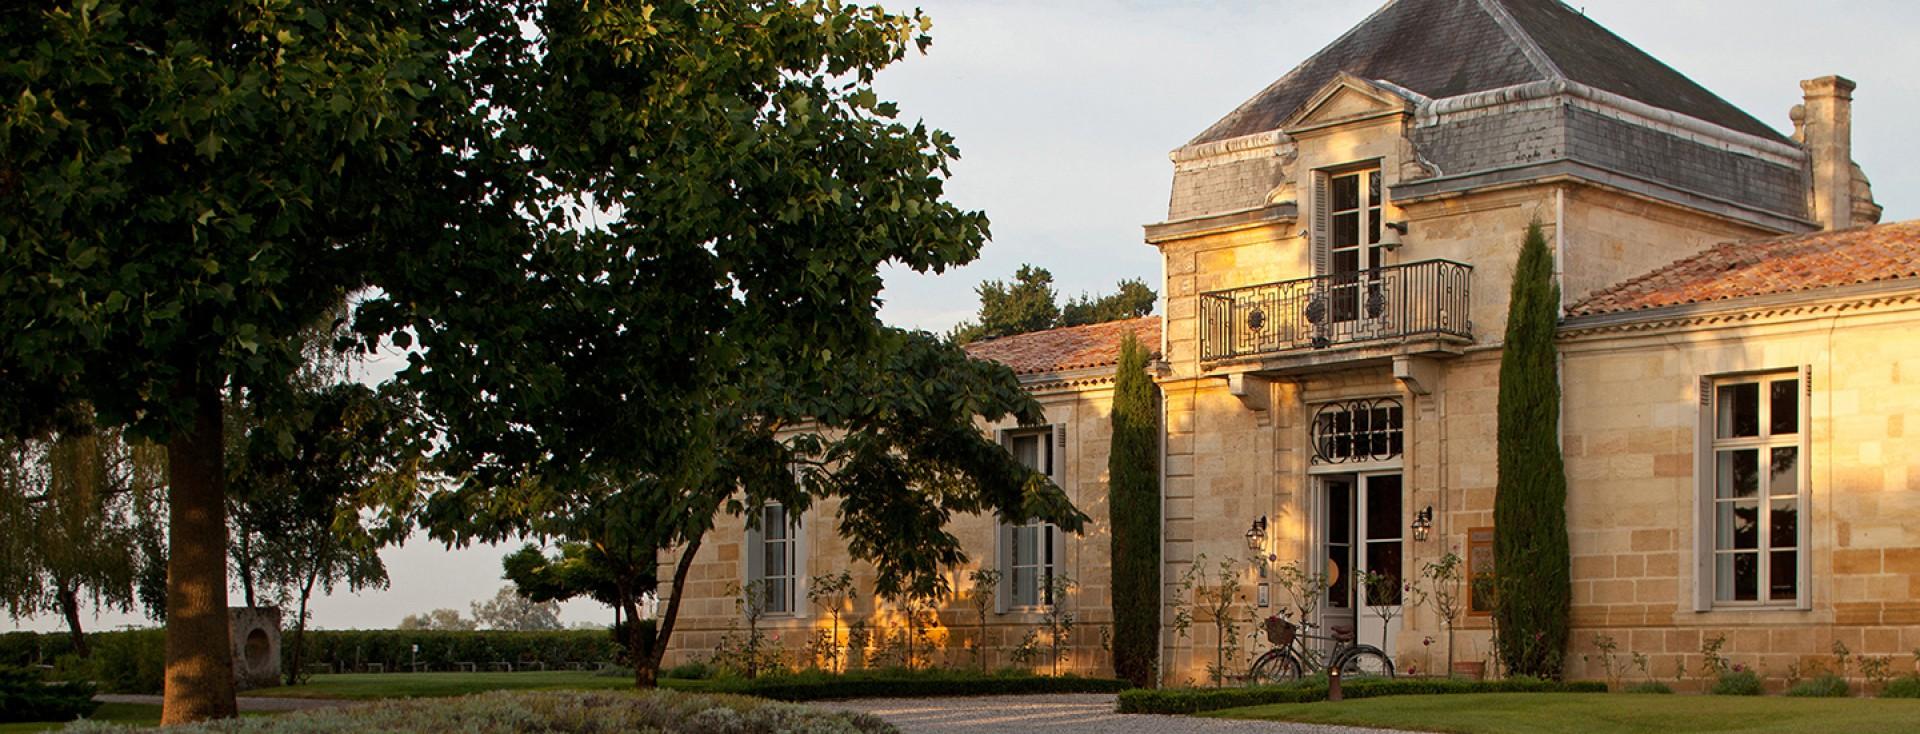 Chateau Hotel Restaurant Gironde